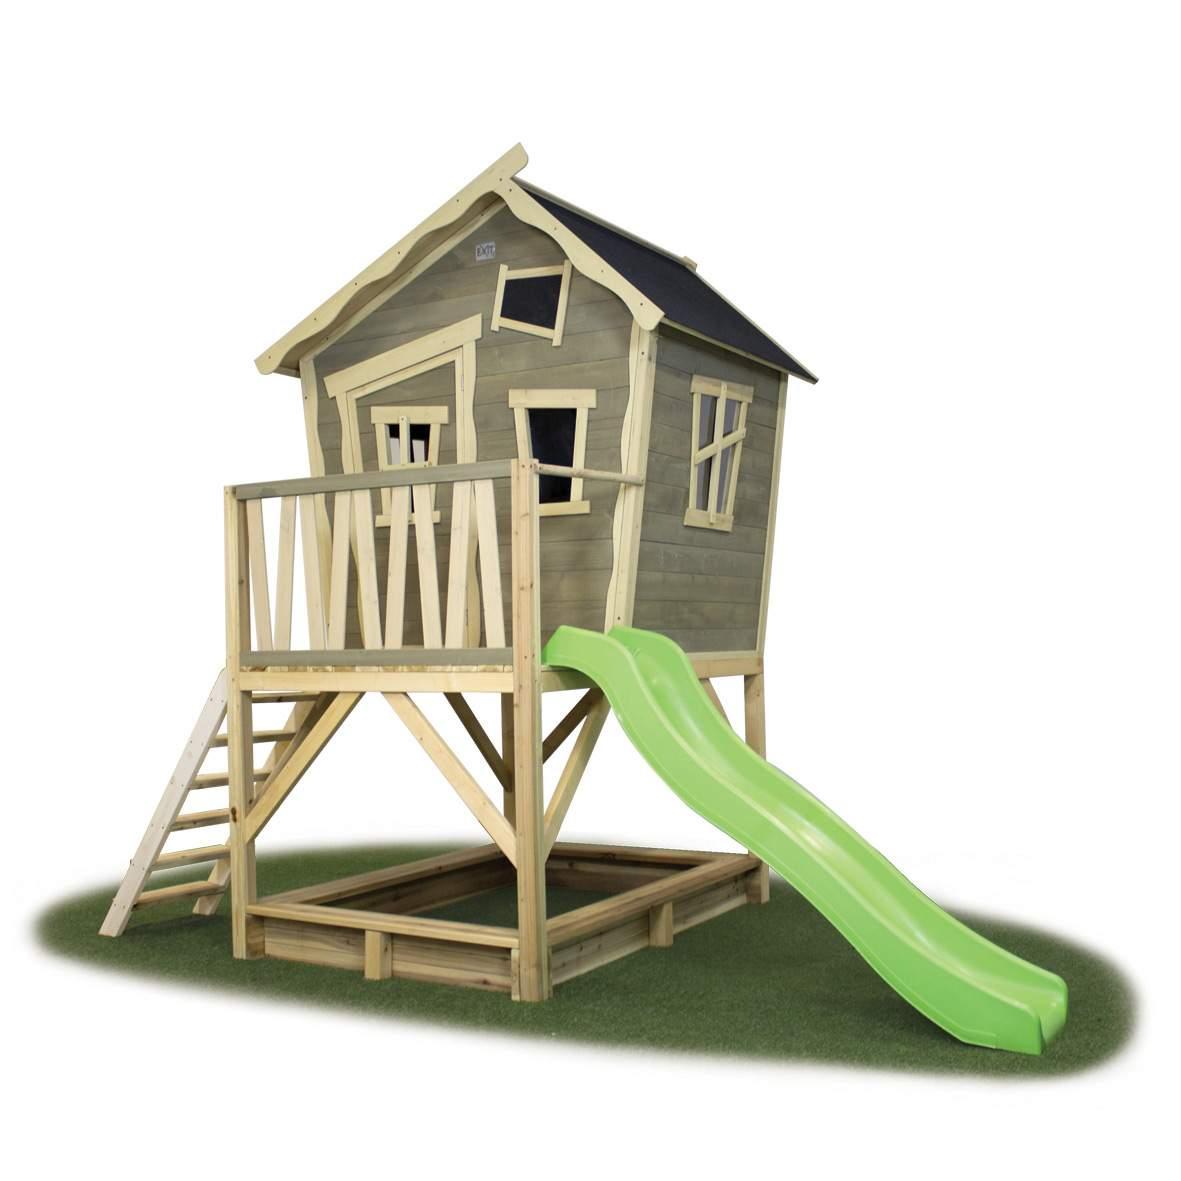 kinder spielhaus exit crooky 500 kinderspielhaus holz stelzenhaus i